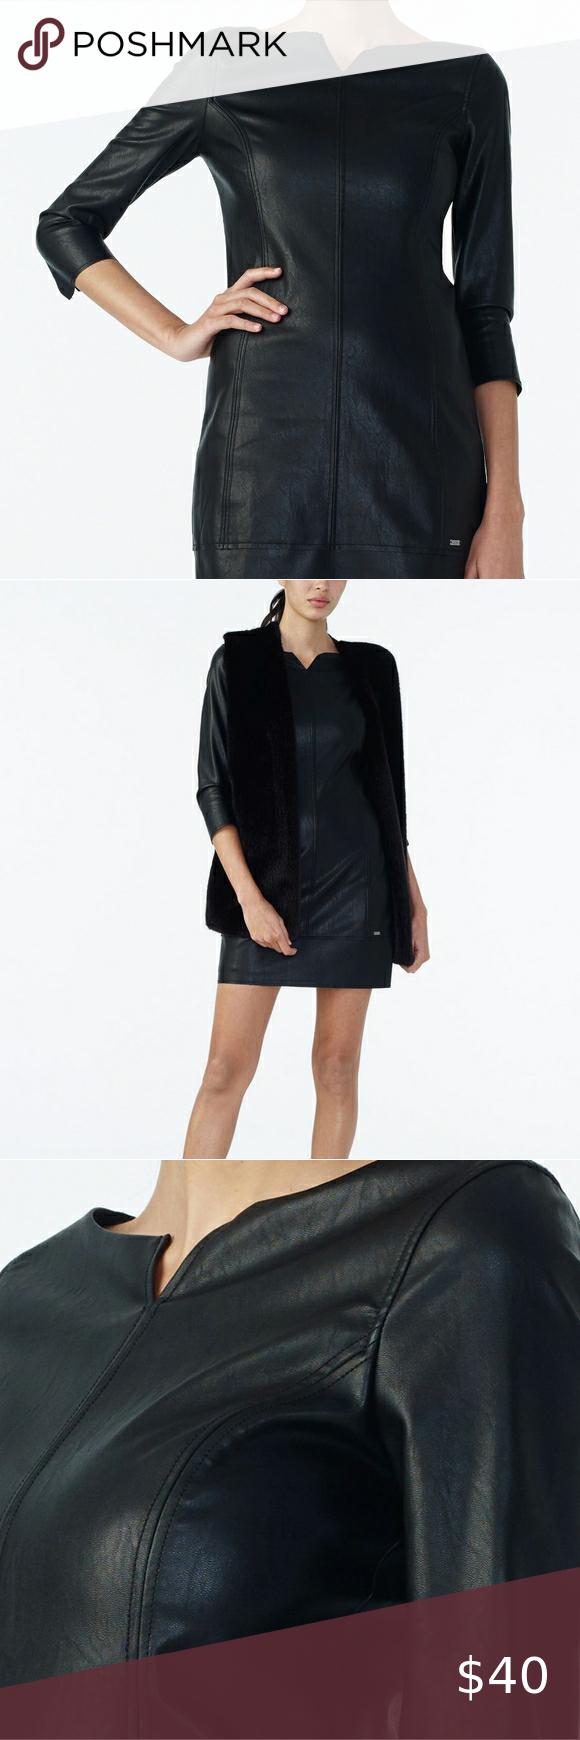 24++ Armani exchange faux leather dress ideas